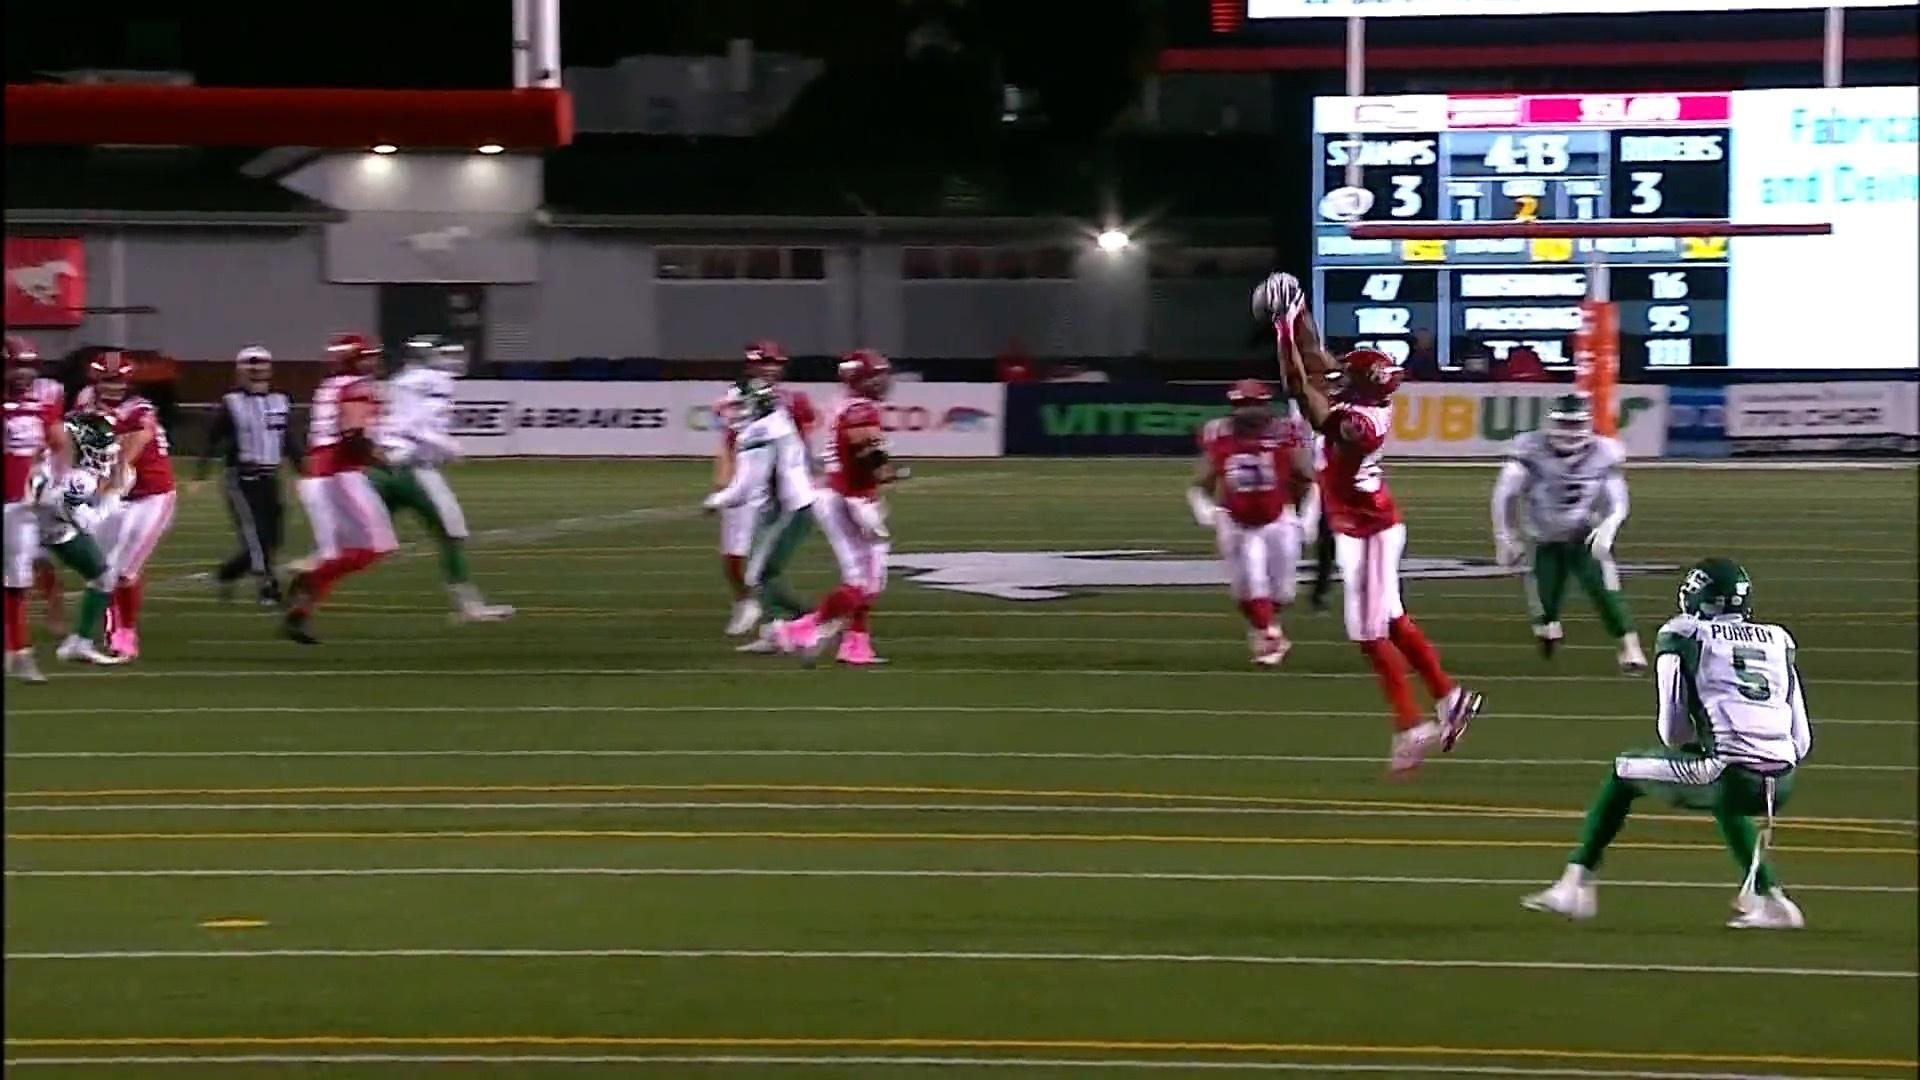 Kamar Jorden catch leads to Carey touchdown